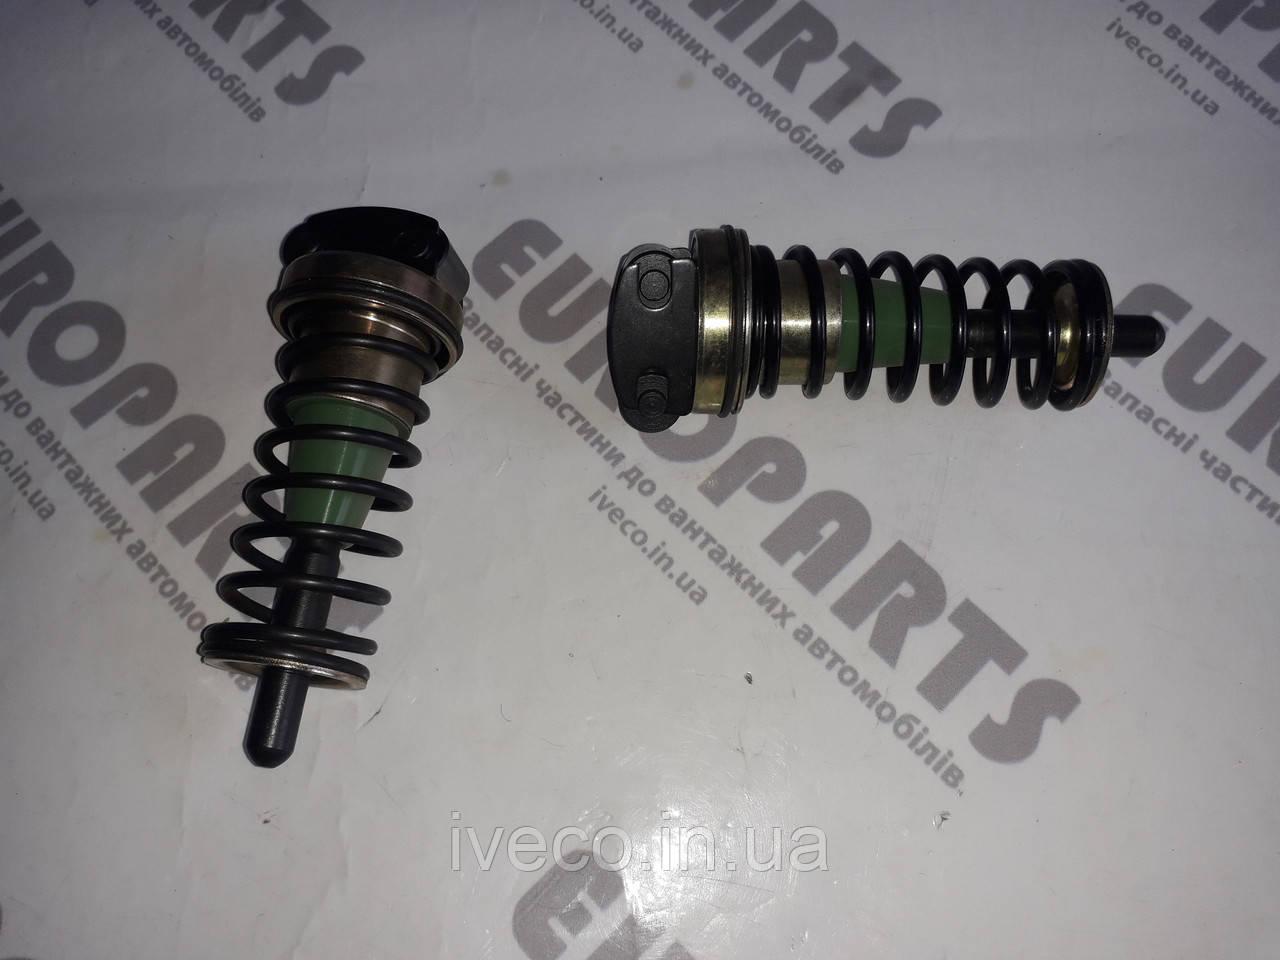 Ремкомплект клинового тормоза шток  тормозного цилиндра Iveco Eurotech Ивеко Евротех 93161768 1505883 DAF